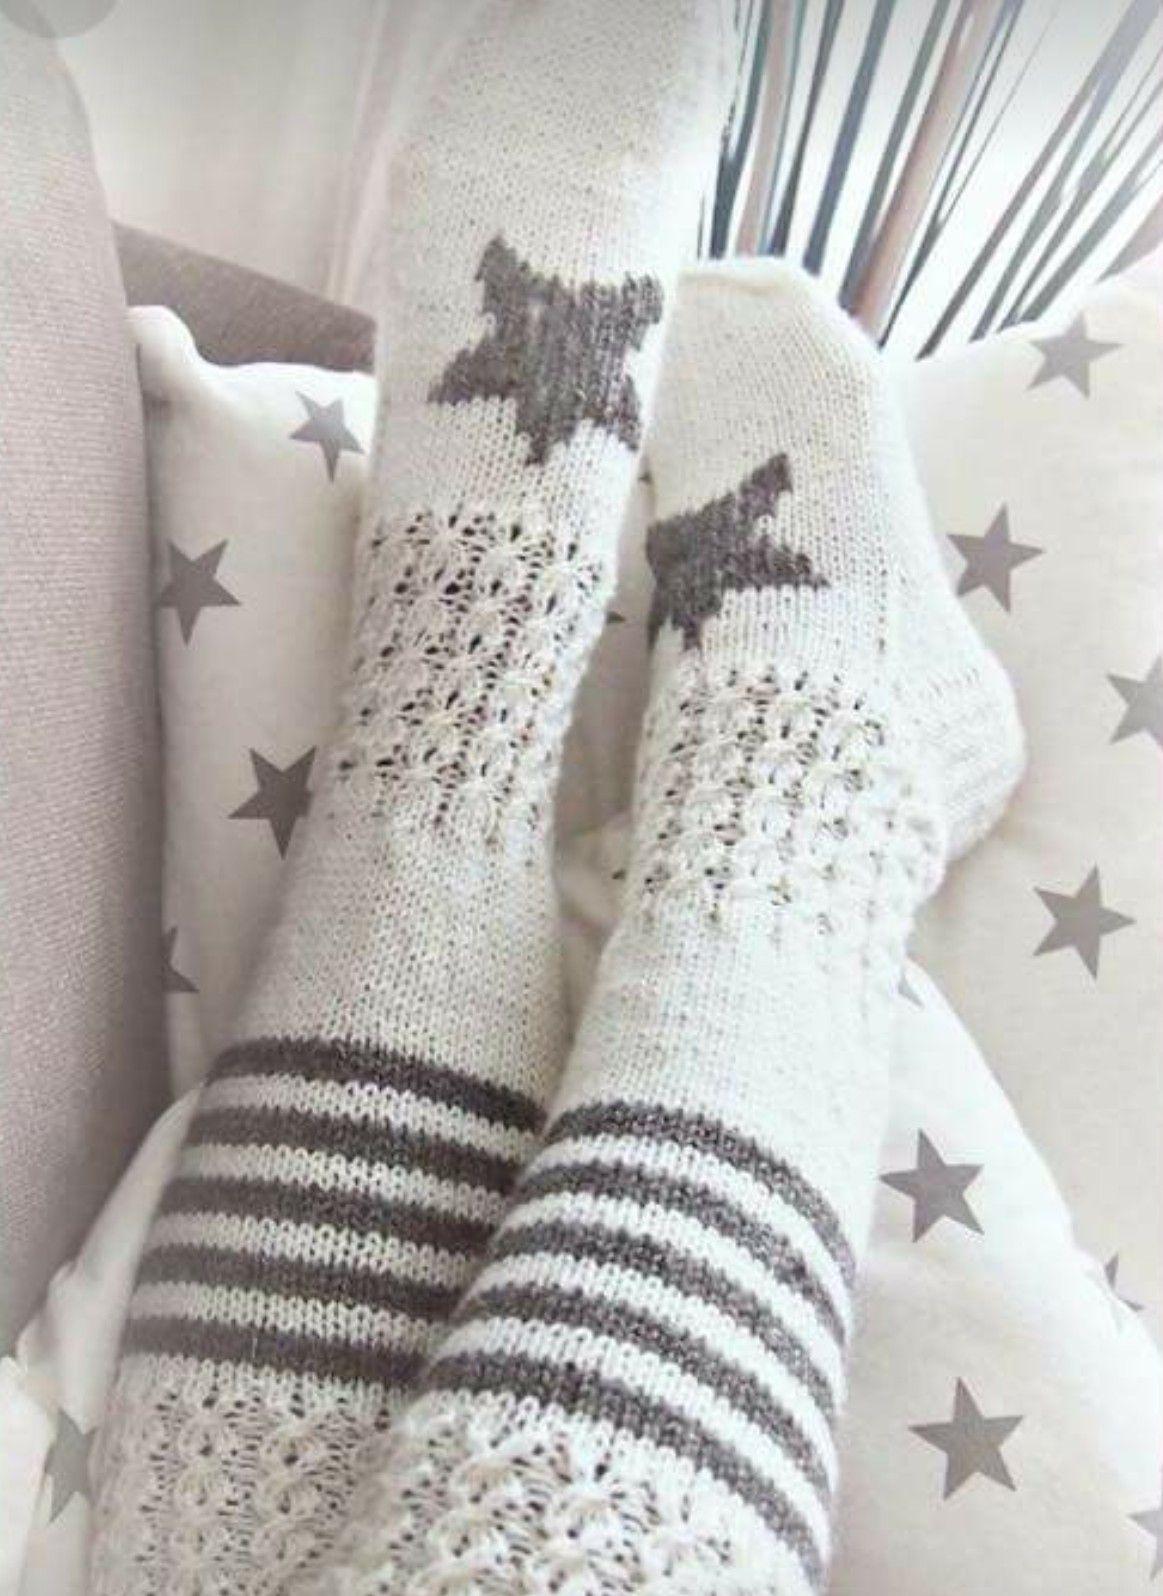 Pin de Terhi Heiskanen en knitting | Pinterest